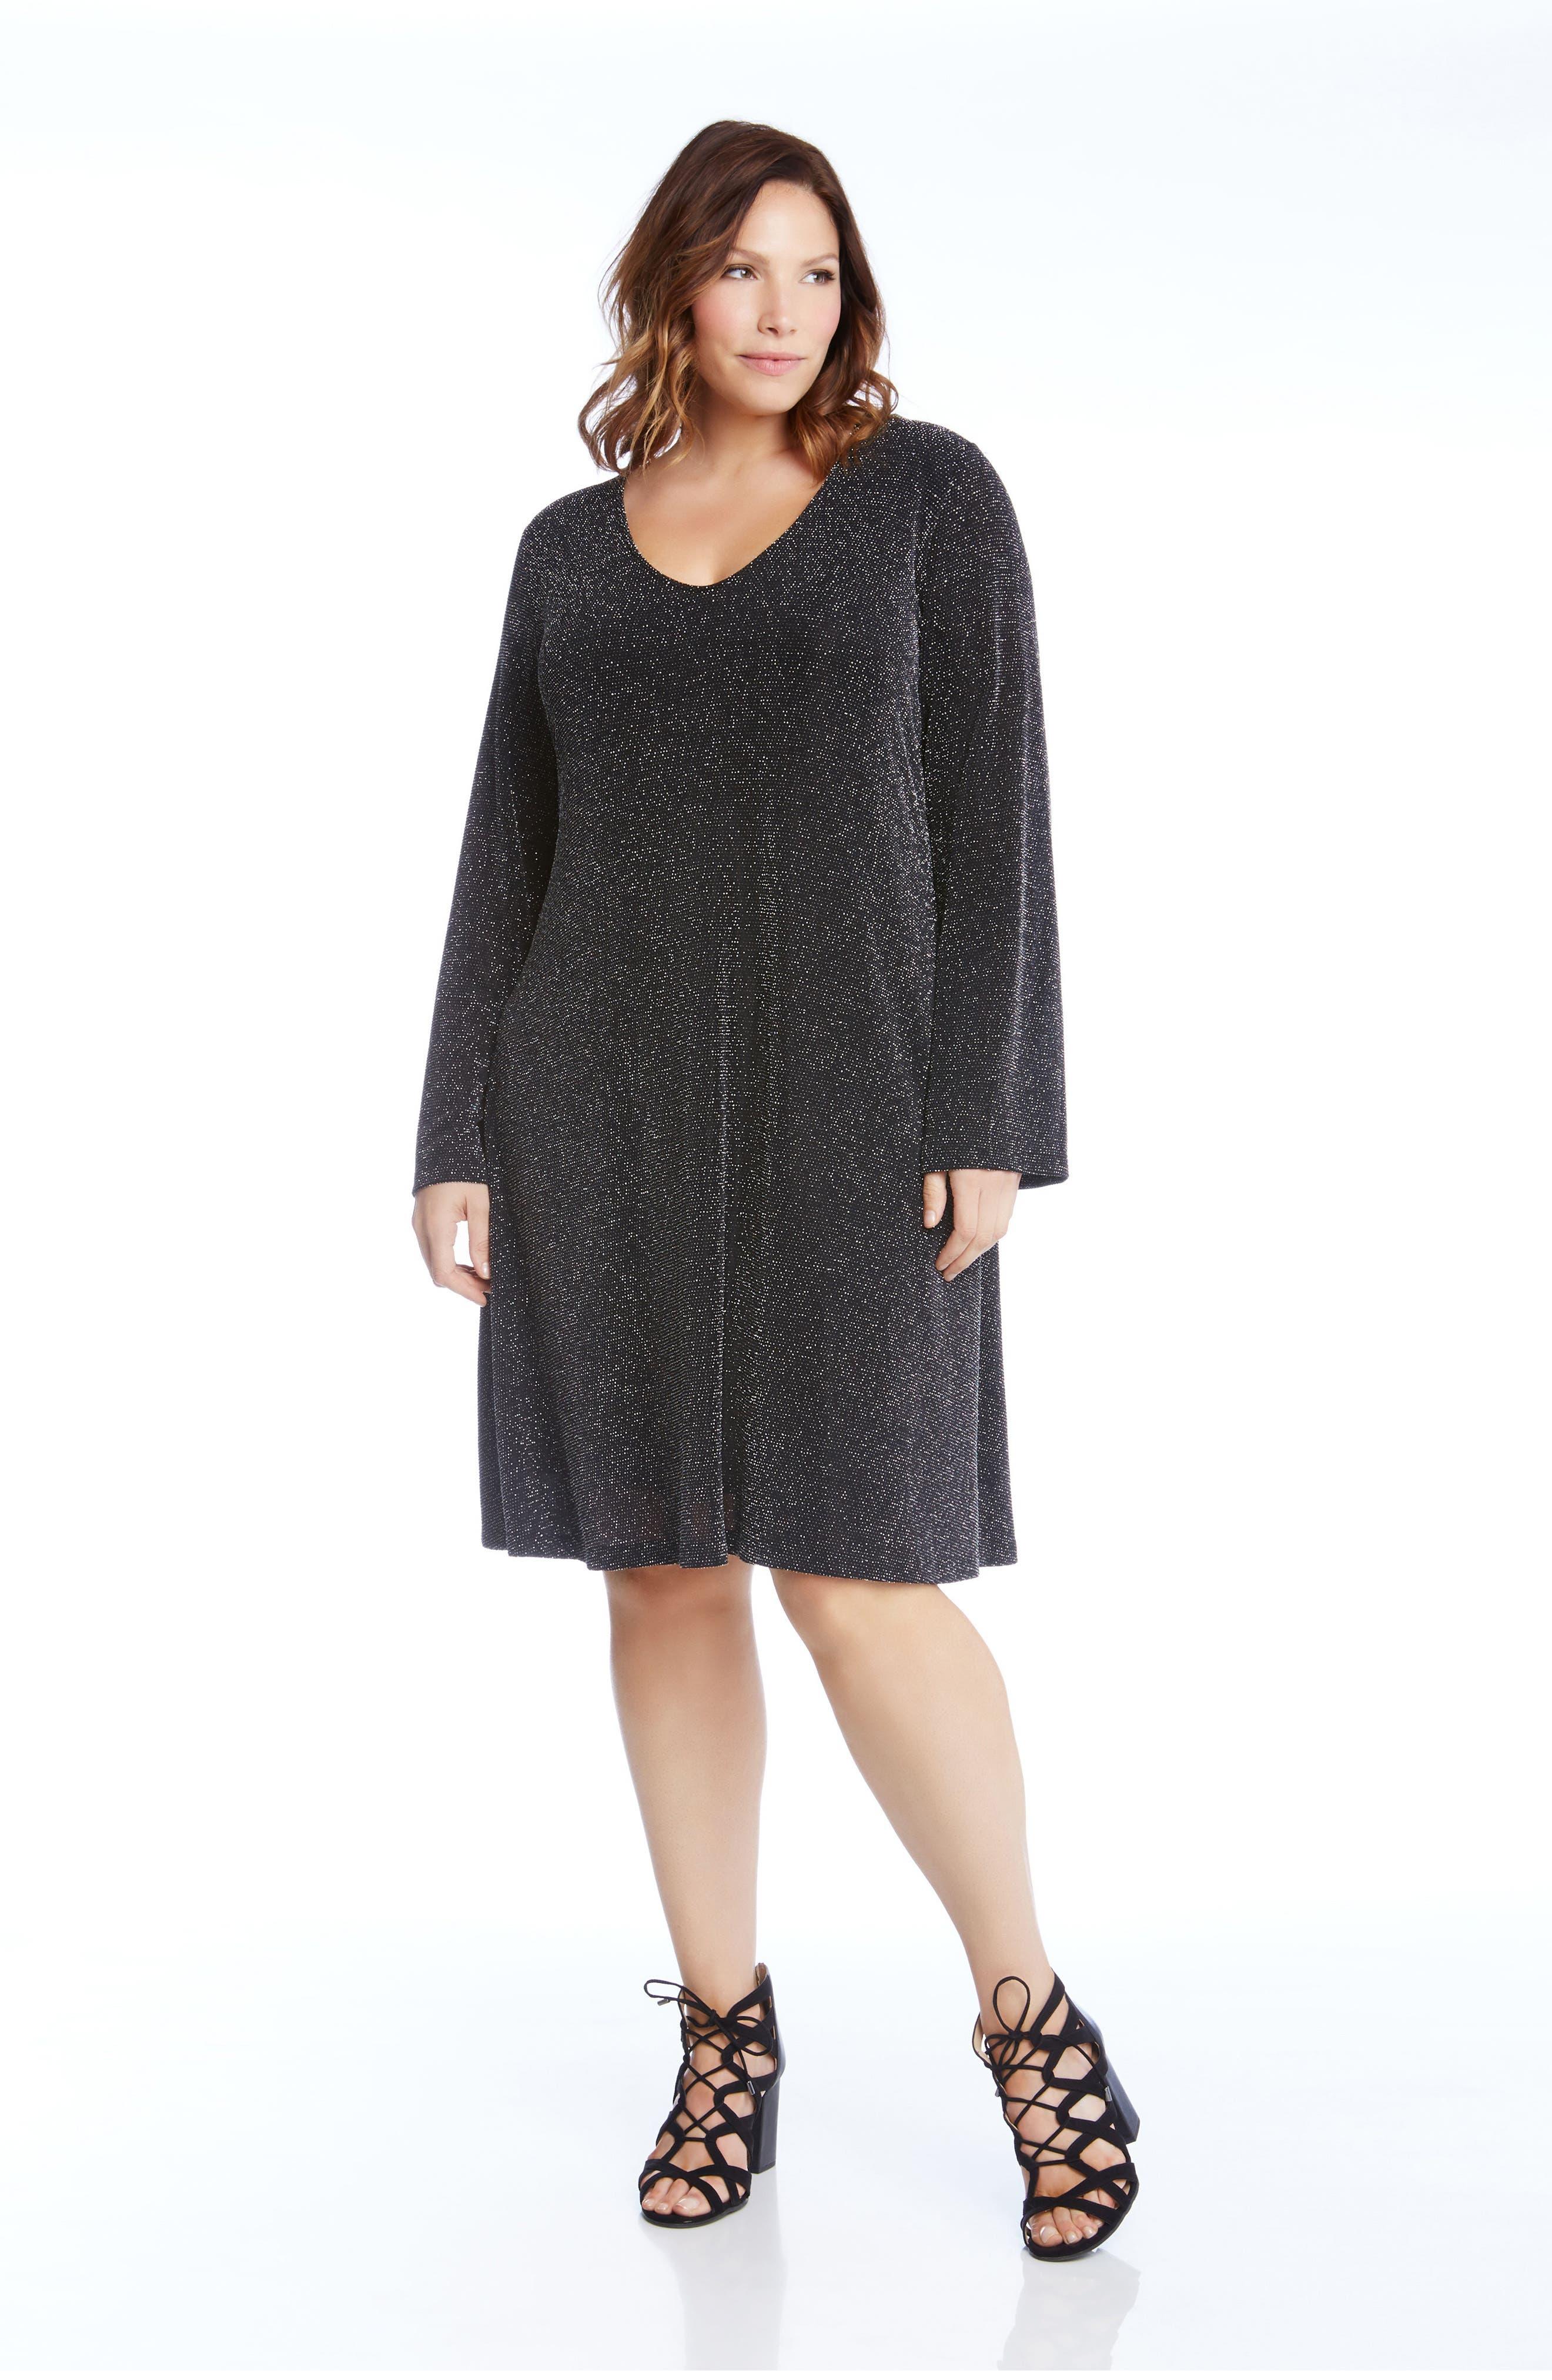 Taylor Sparkle Knit Dress,                             Alternate thumbnail 3, color,                             044